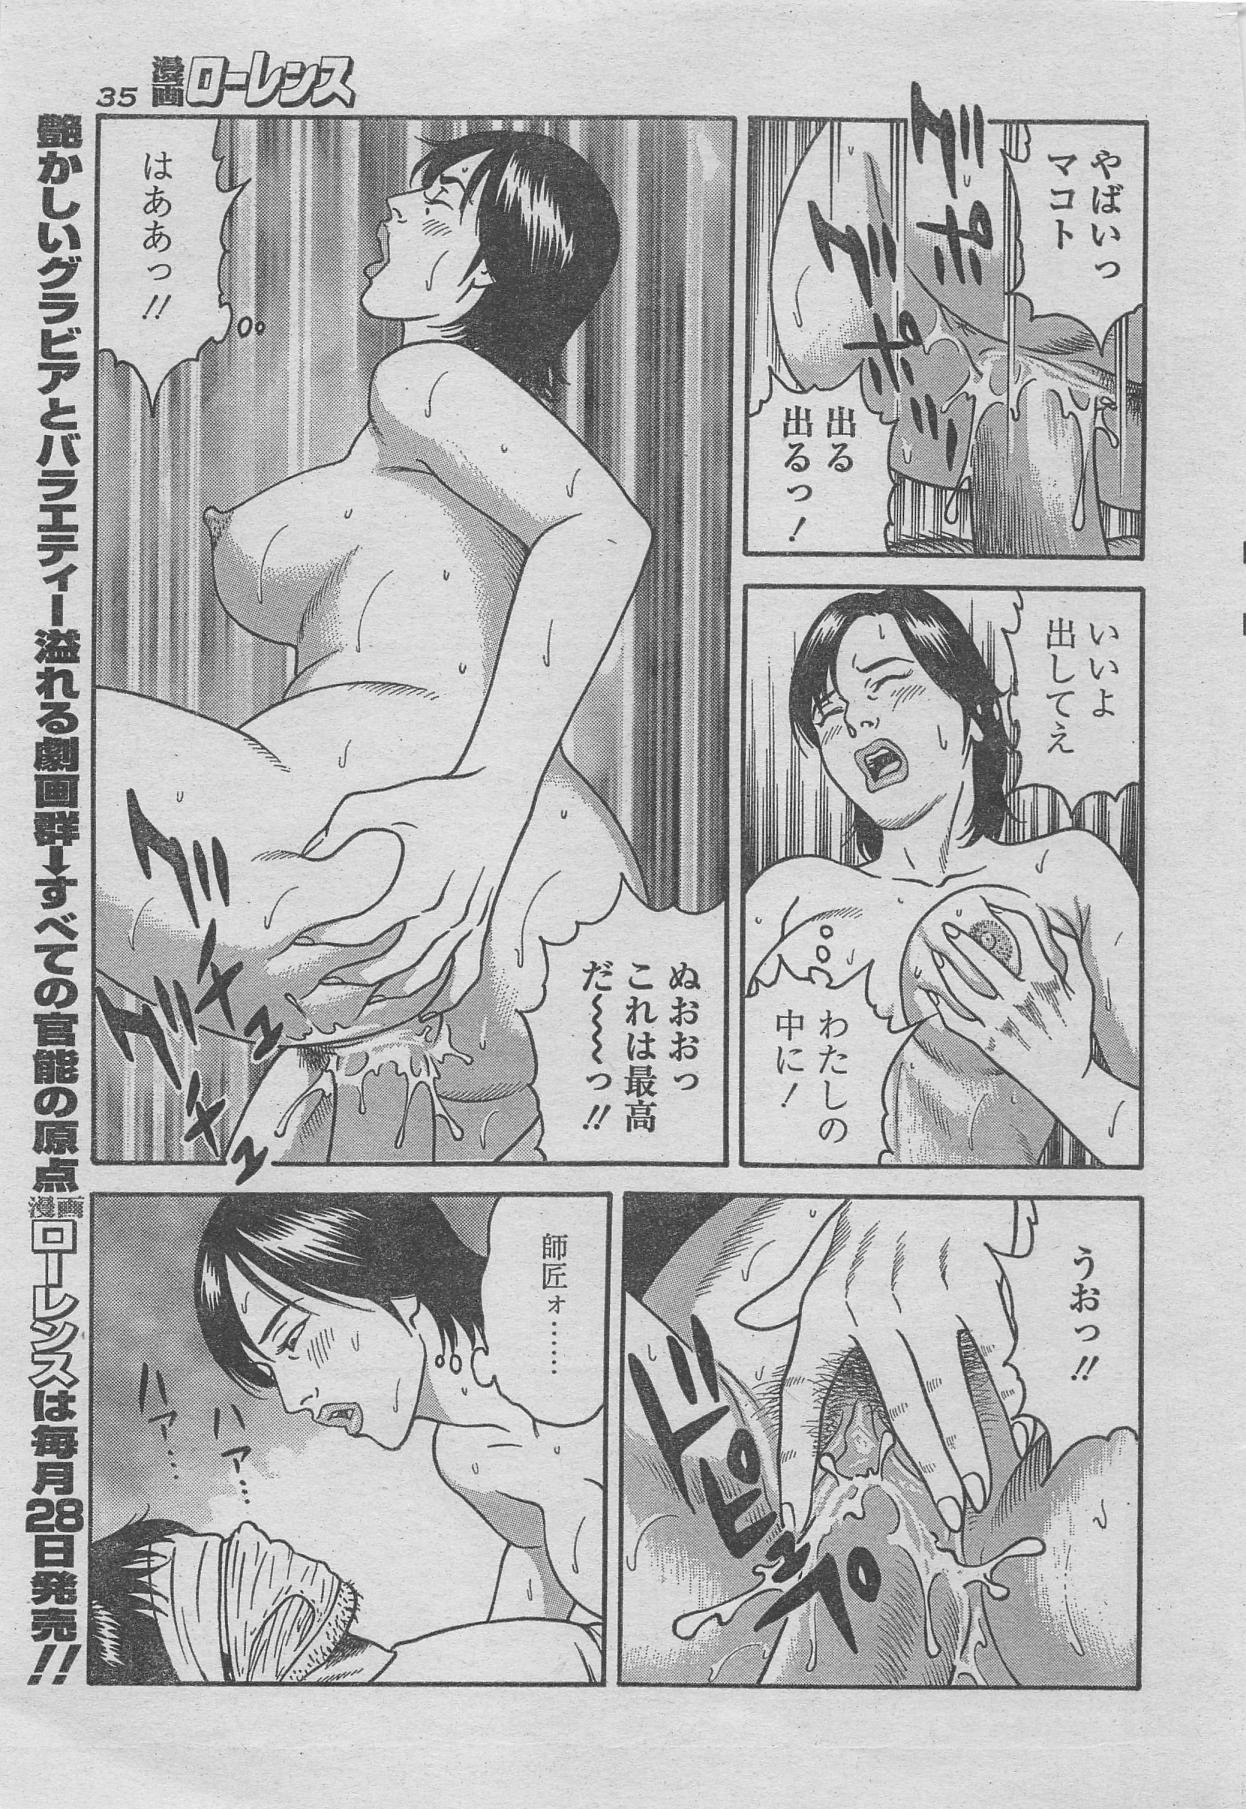 Manga Lawrence 2013-04 22